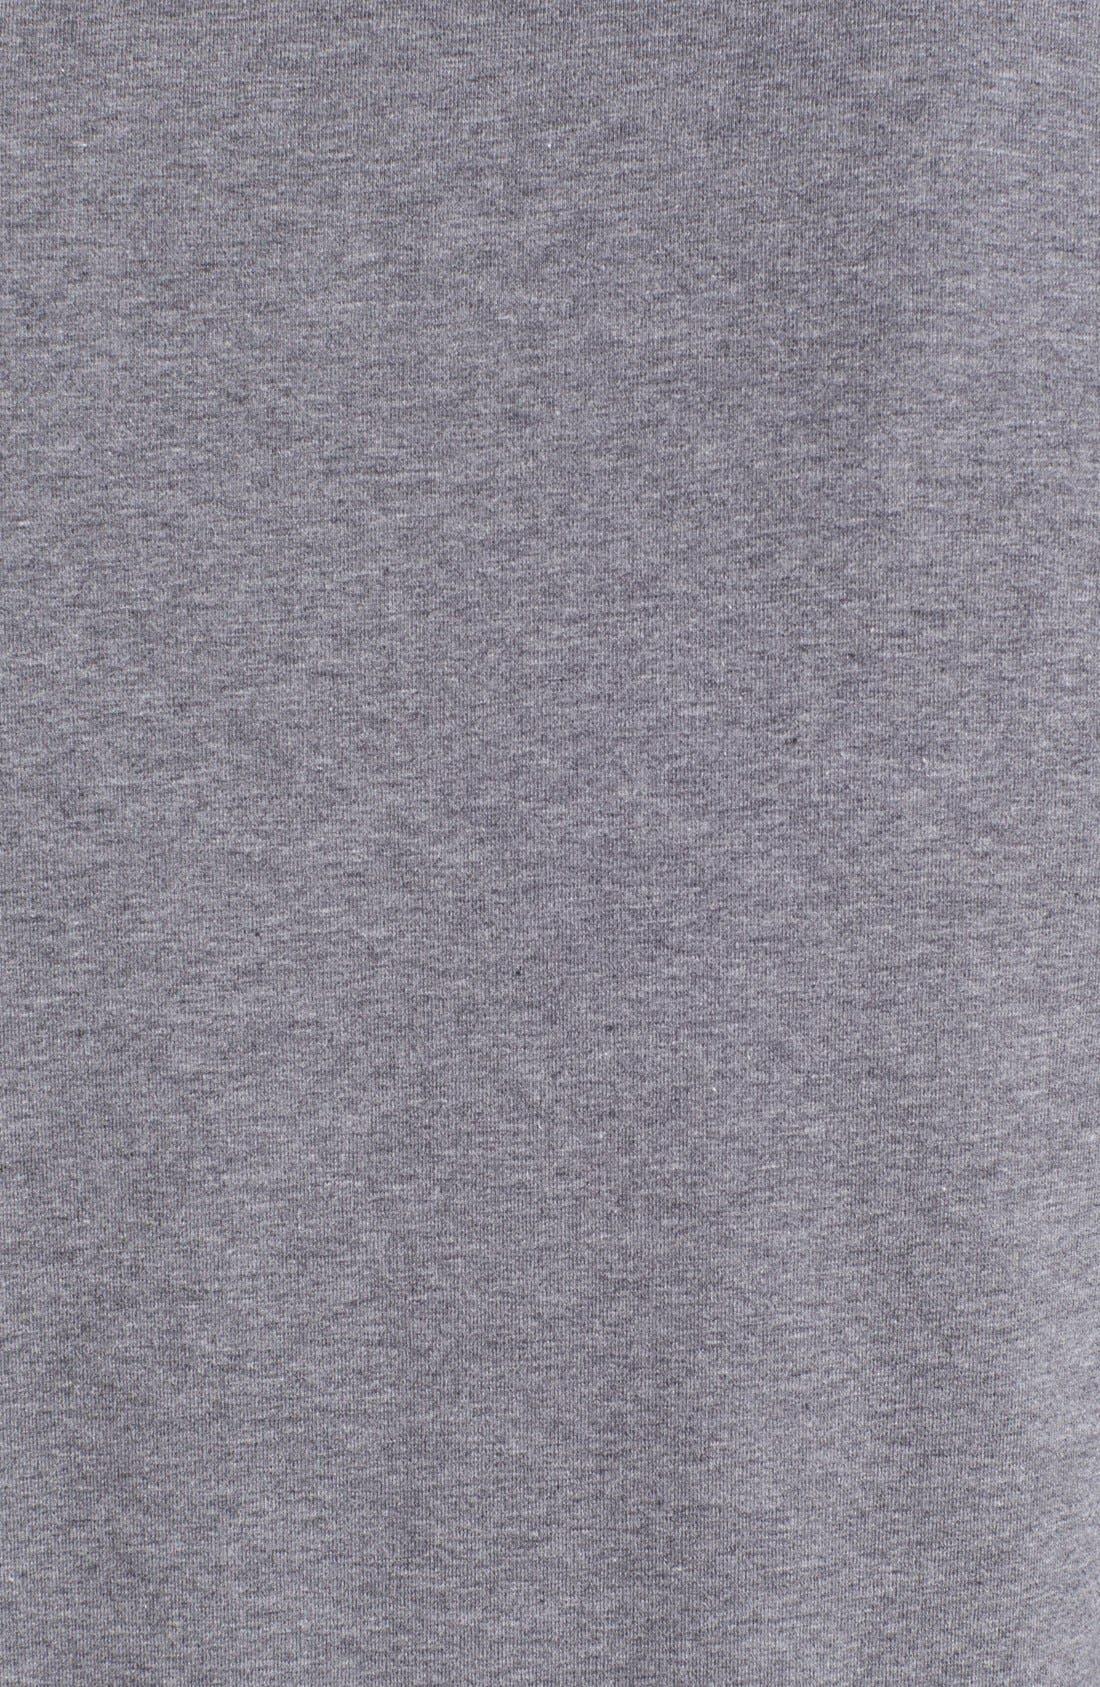 Alternate Image 3  - Michael Kors Fleece Long Sleeve Top